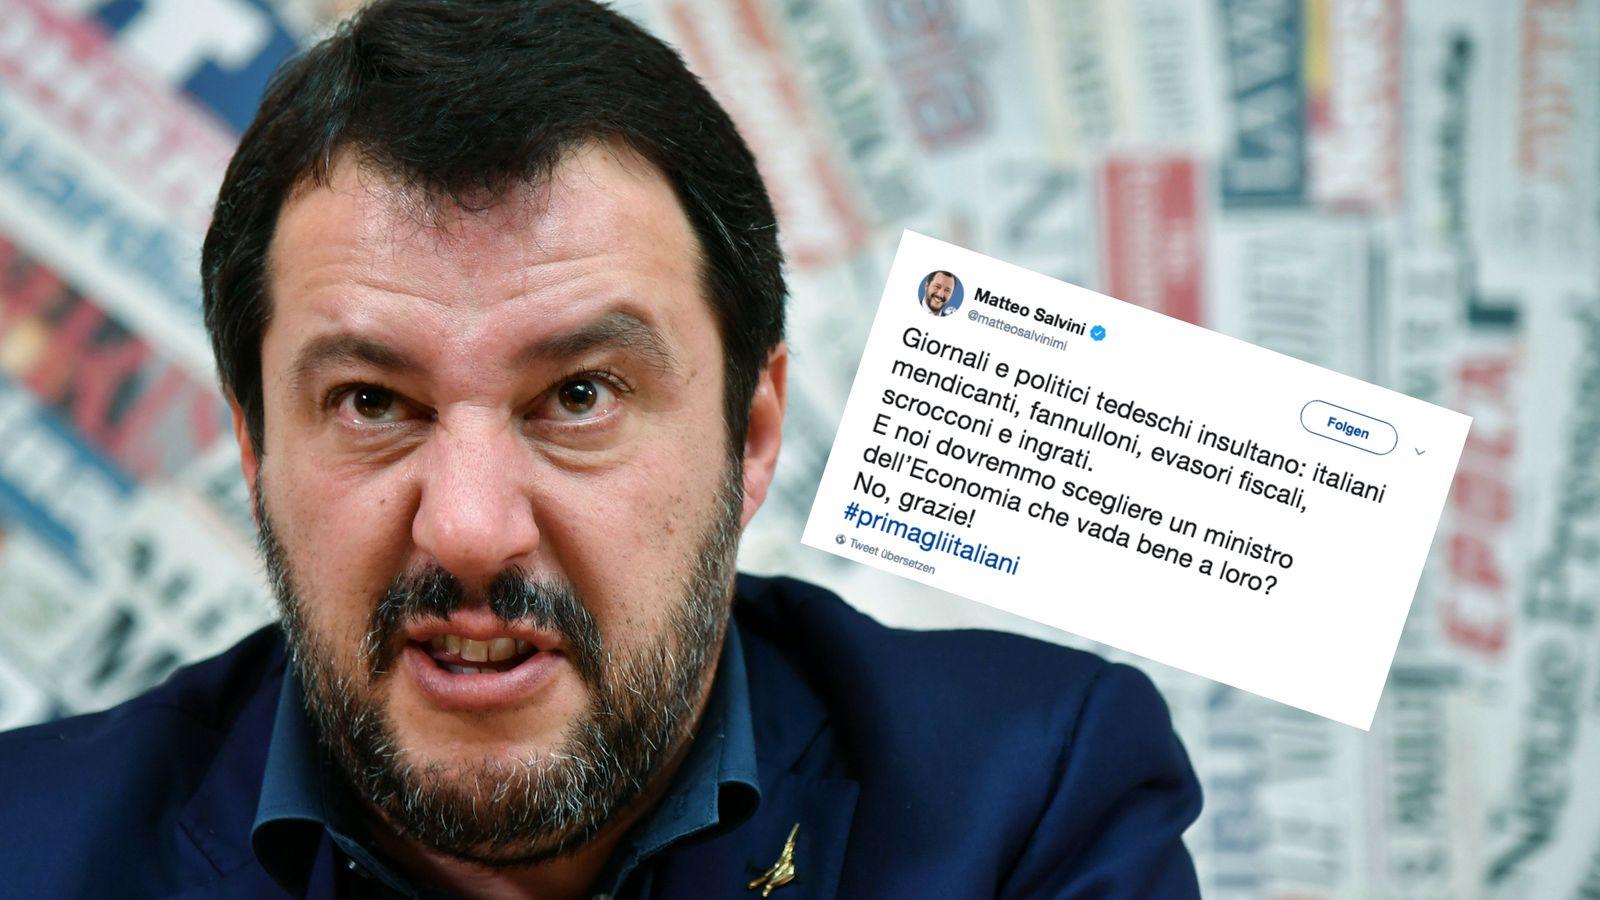 Lega kommt Mattarella nicht entgegen